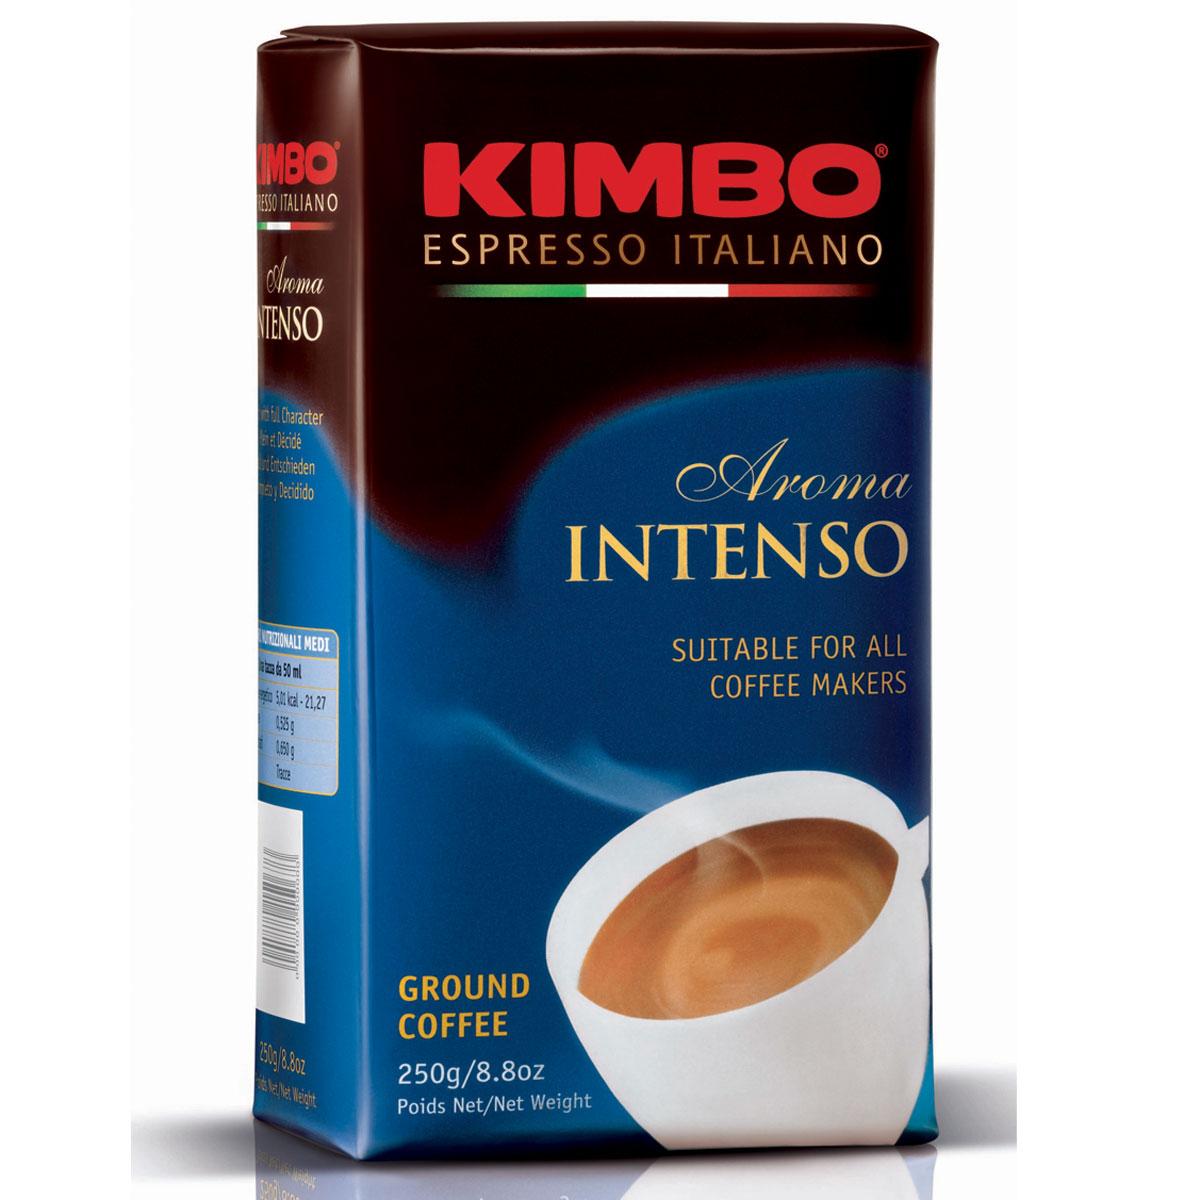 Kimbo Aroma Intenso кофе молотый, 250 г